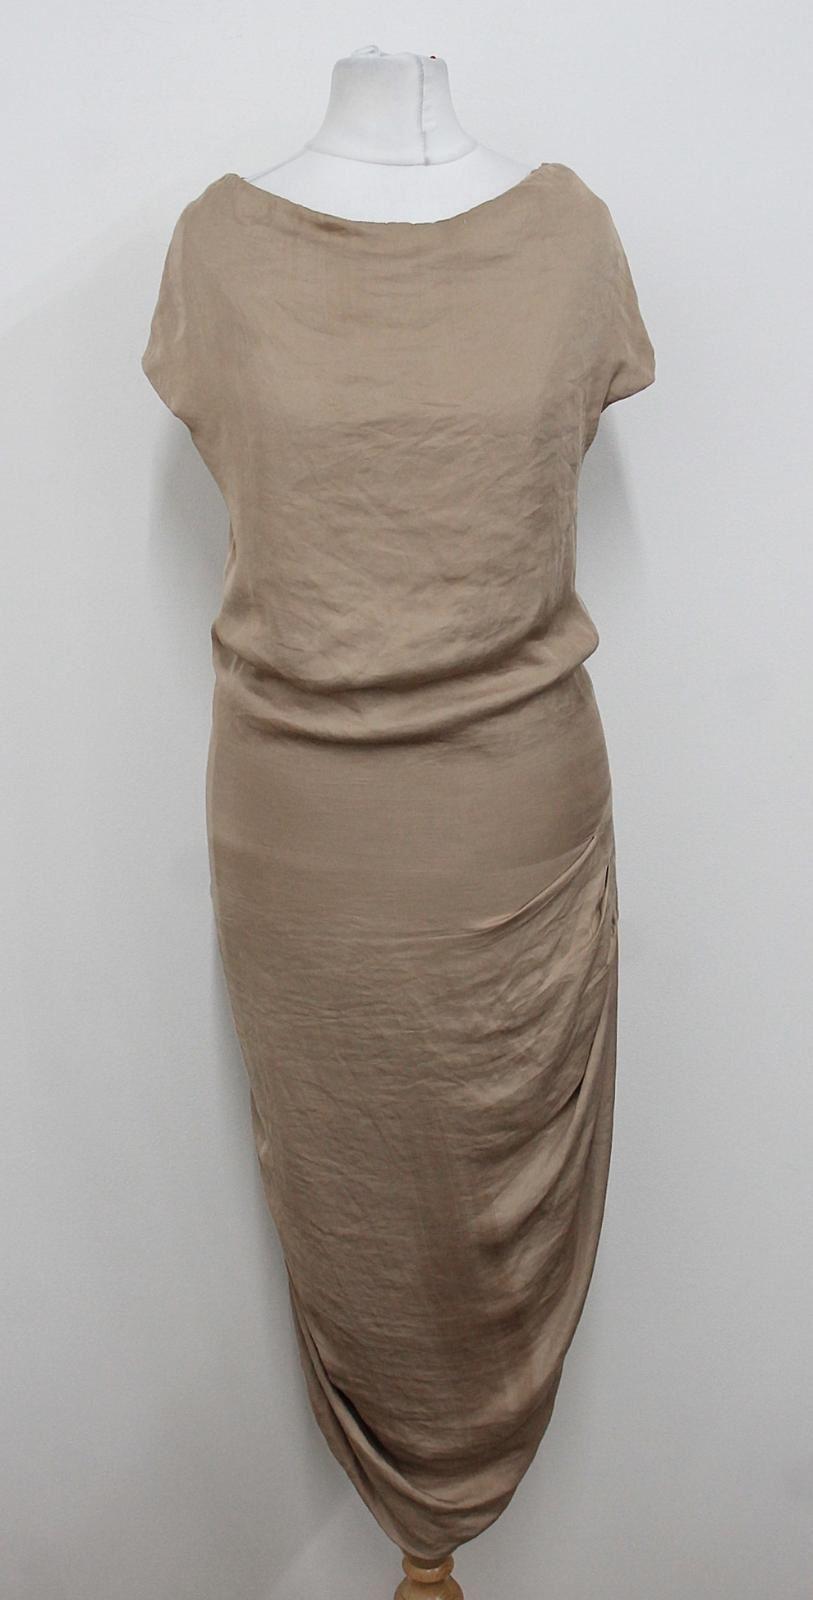 ALL-SAINTS-SPITALFIELDS-Ladies-Tan-Beige-Sleeveless-Ruched-Dress-Size-UK10